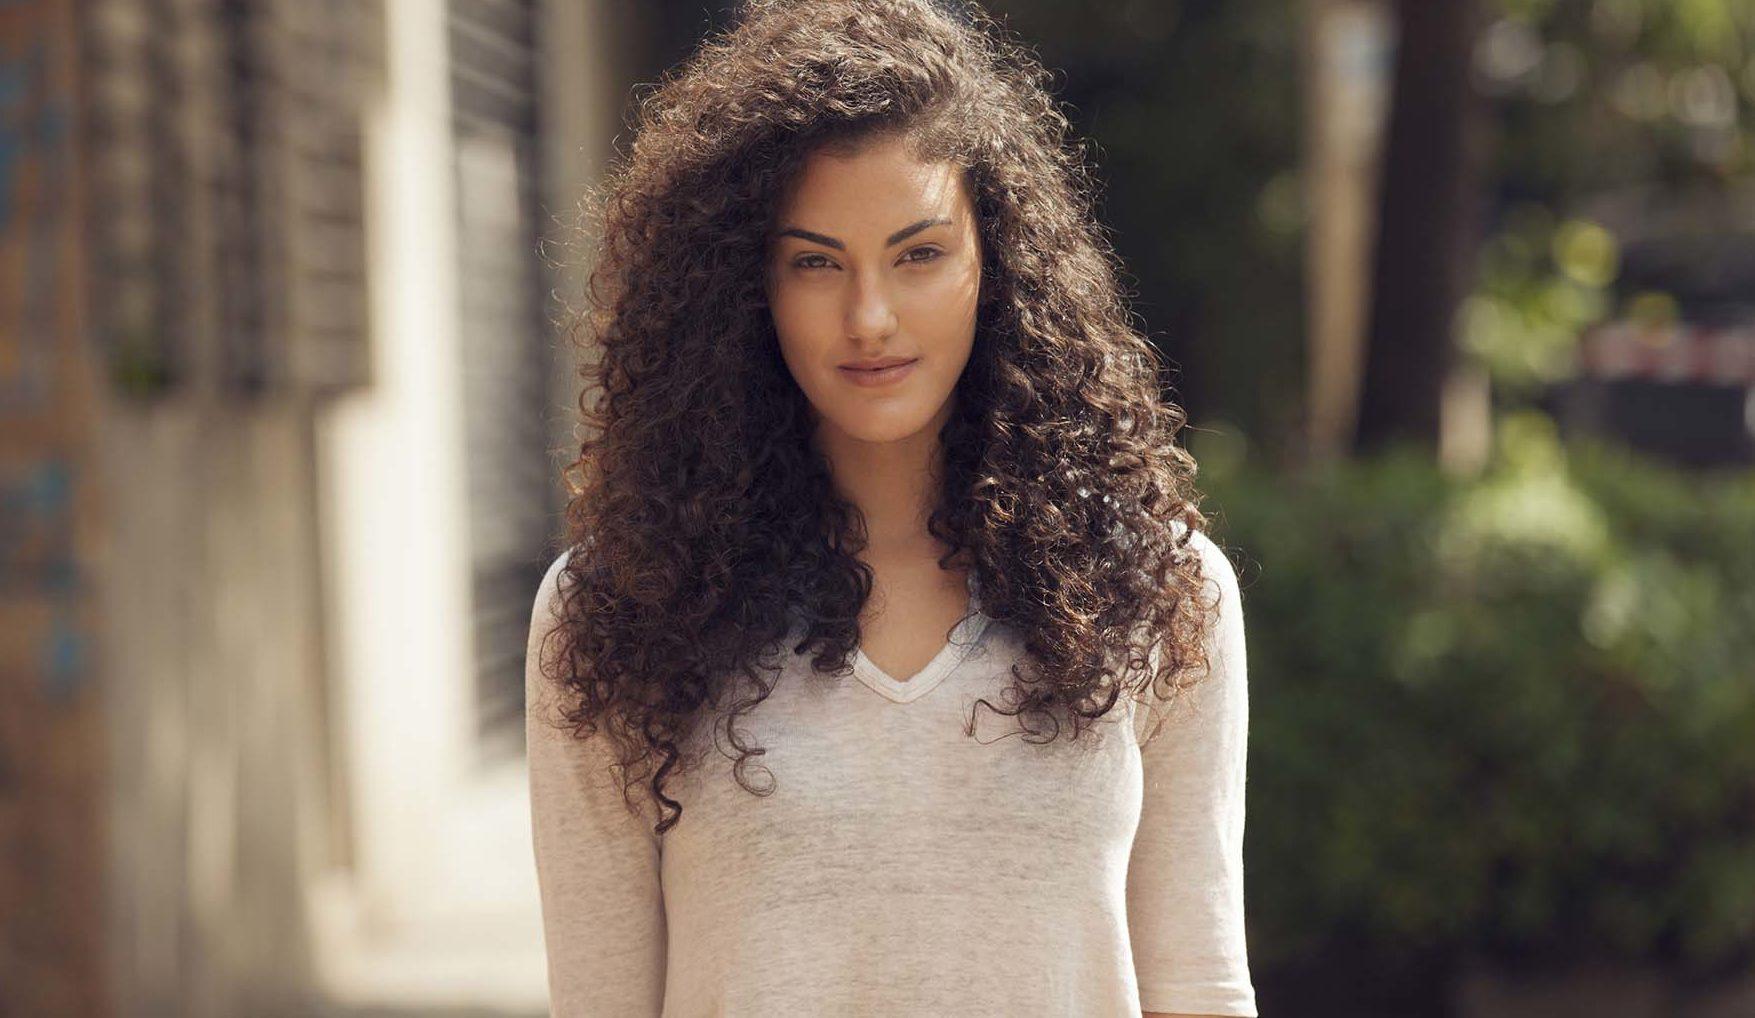 modelo de como arrumar cabelo cacheado longo, look final